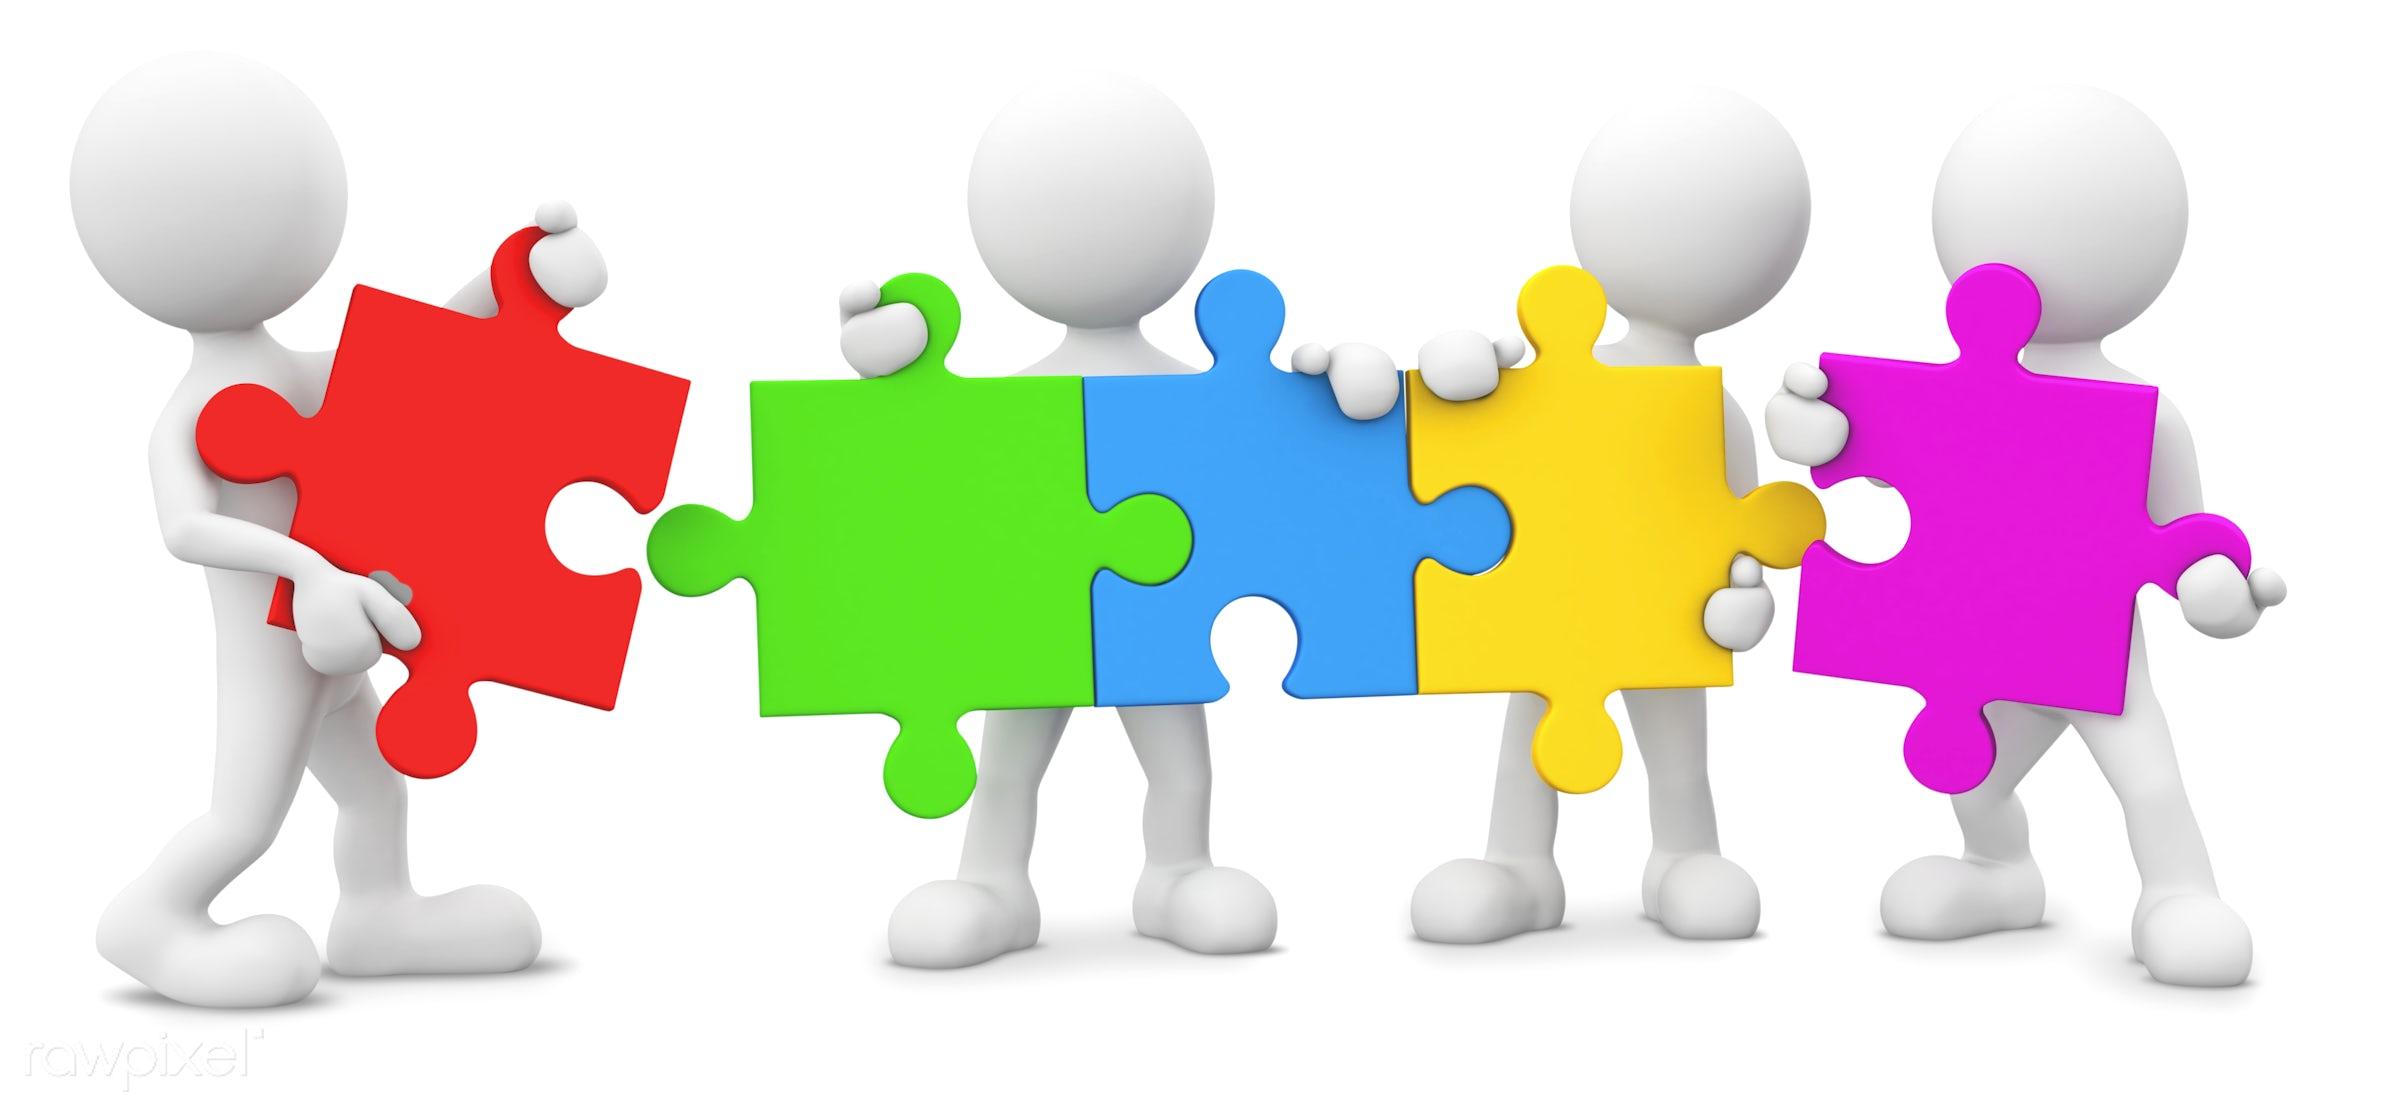 3D men holding jigsaw. - 3d, 3d man, blank, brainstorm, businesnee, colorfull jigsaw, cooperation, copy space, empty, five...